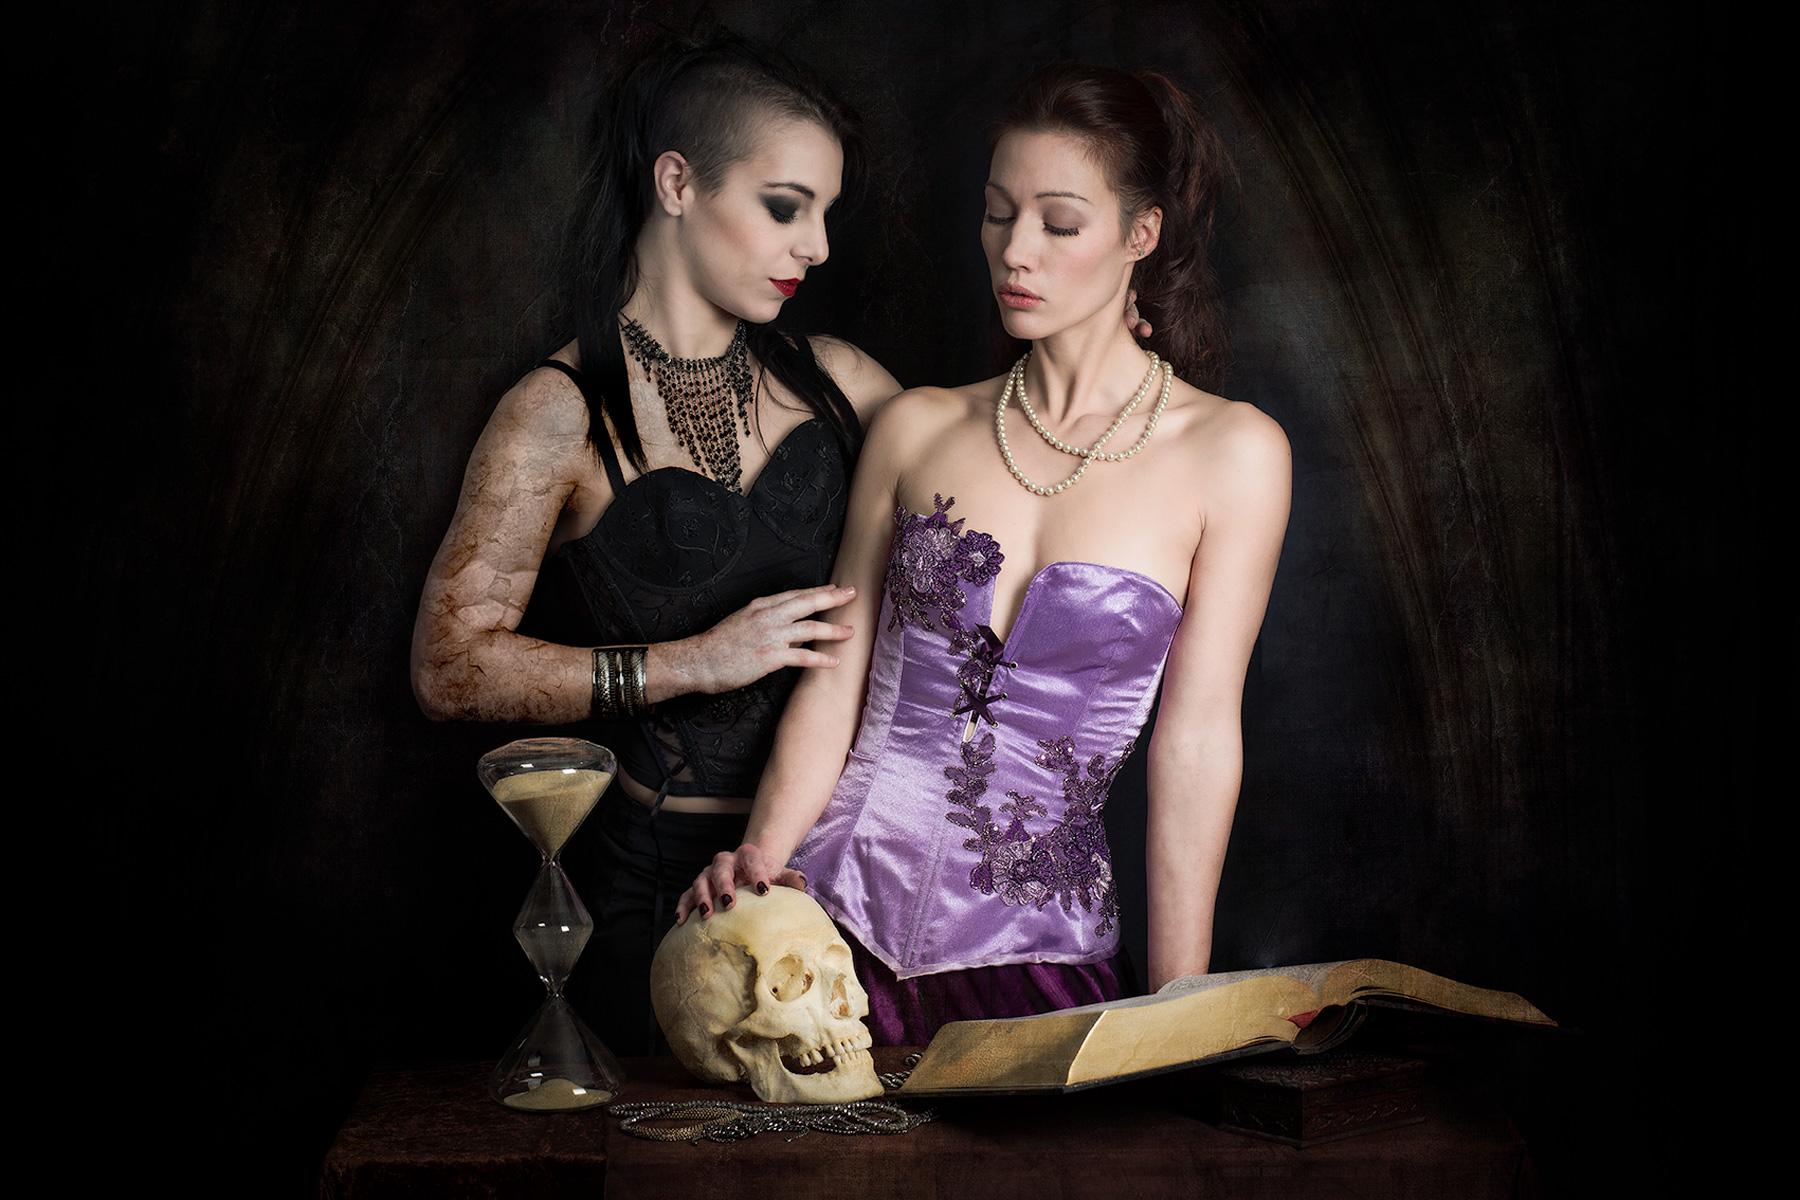 Les vanit s philippe bousseau photographie - Vanite des vanites tout n est que vanite ...